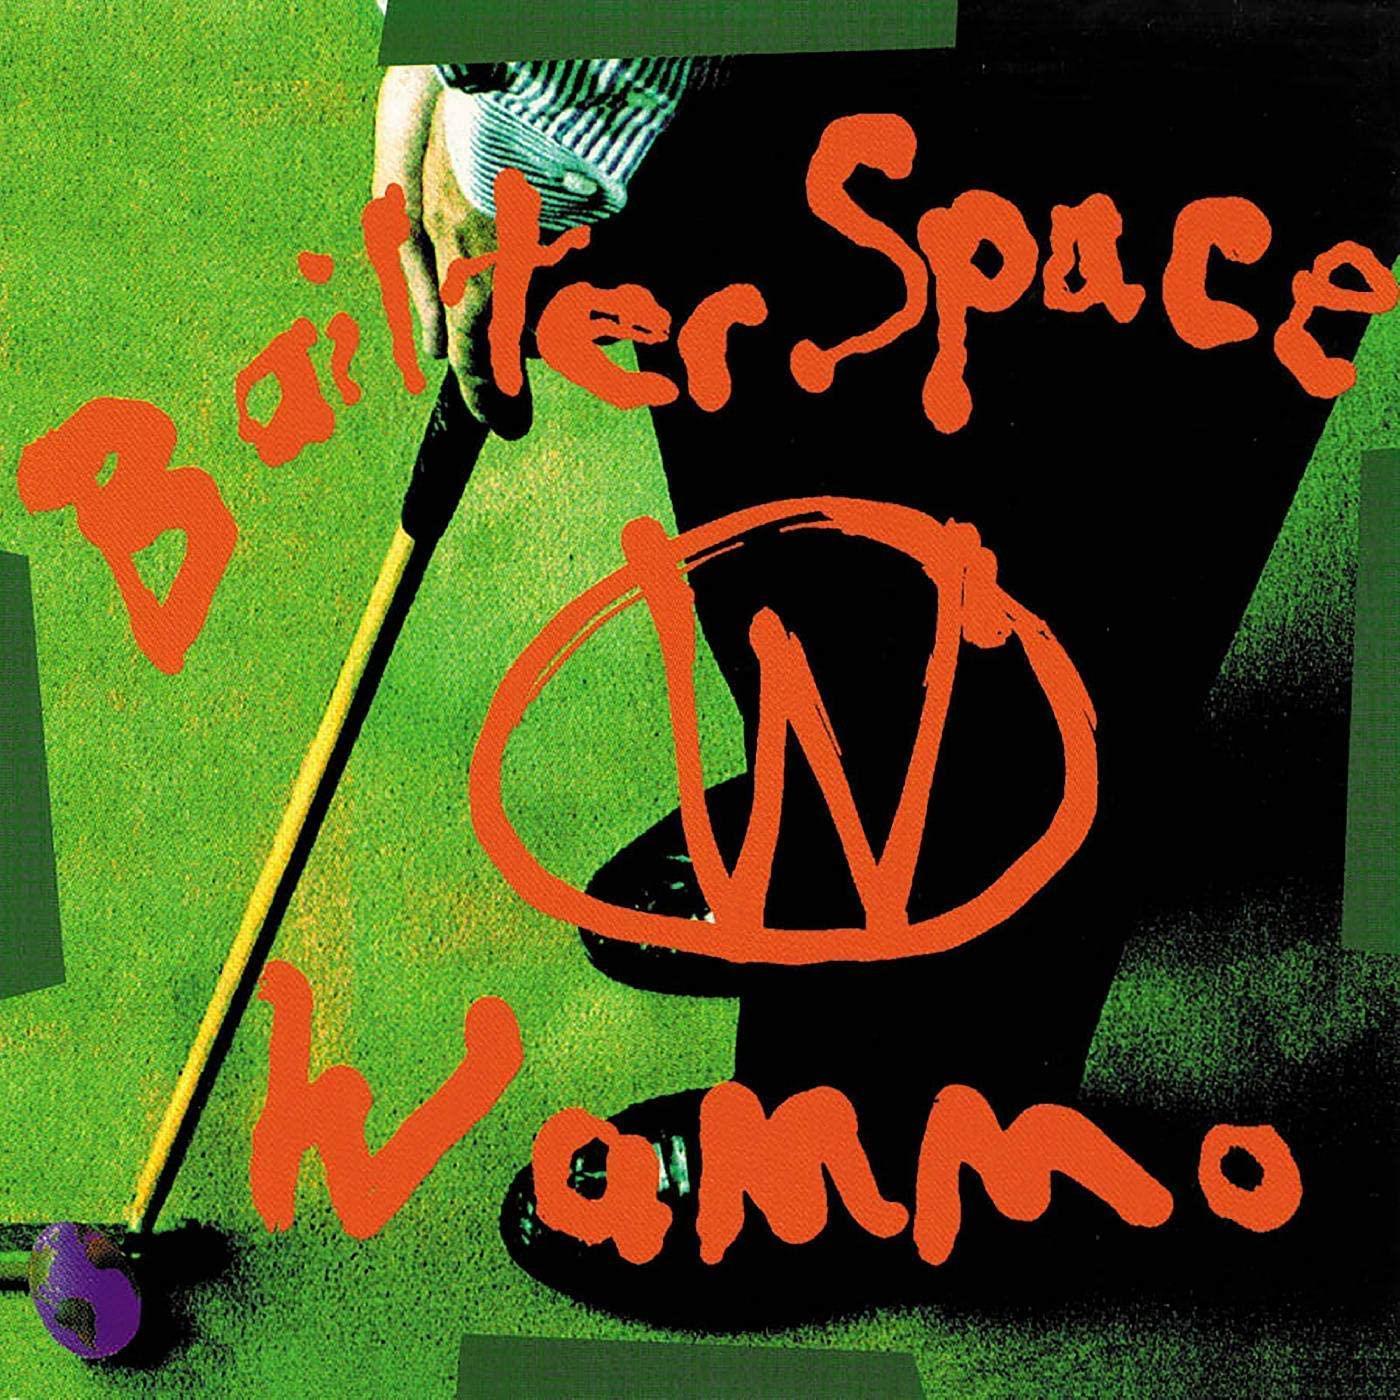 Bailter Space - Wammo [LP]